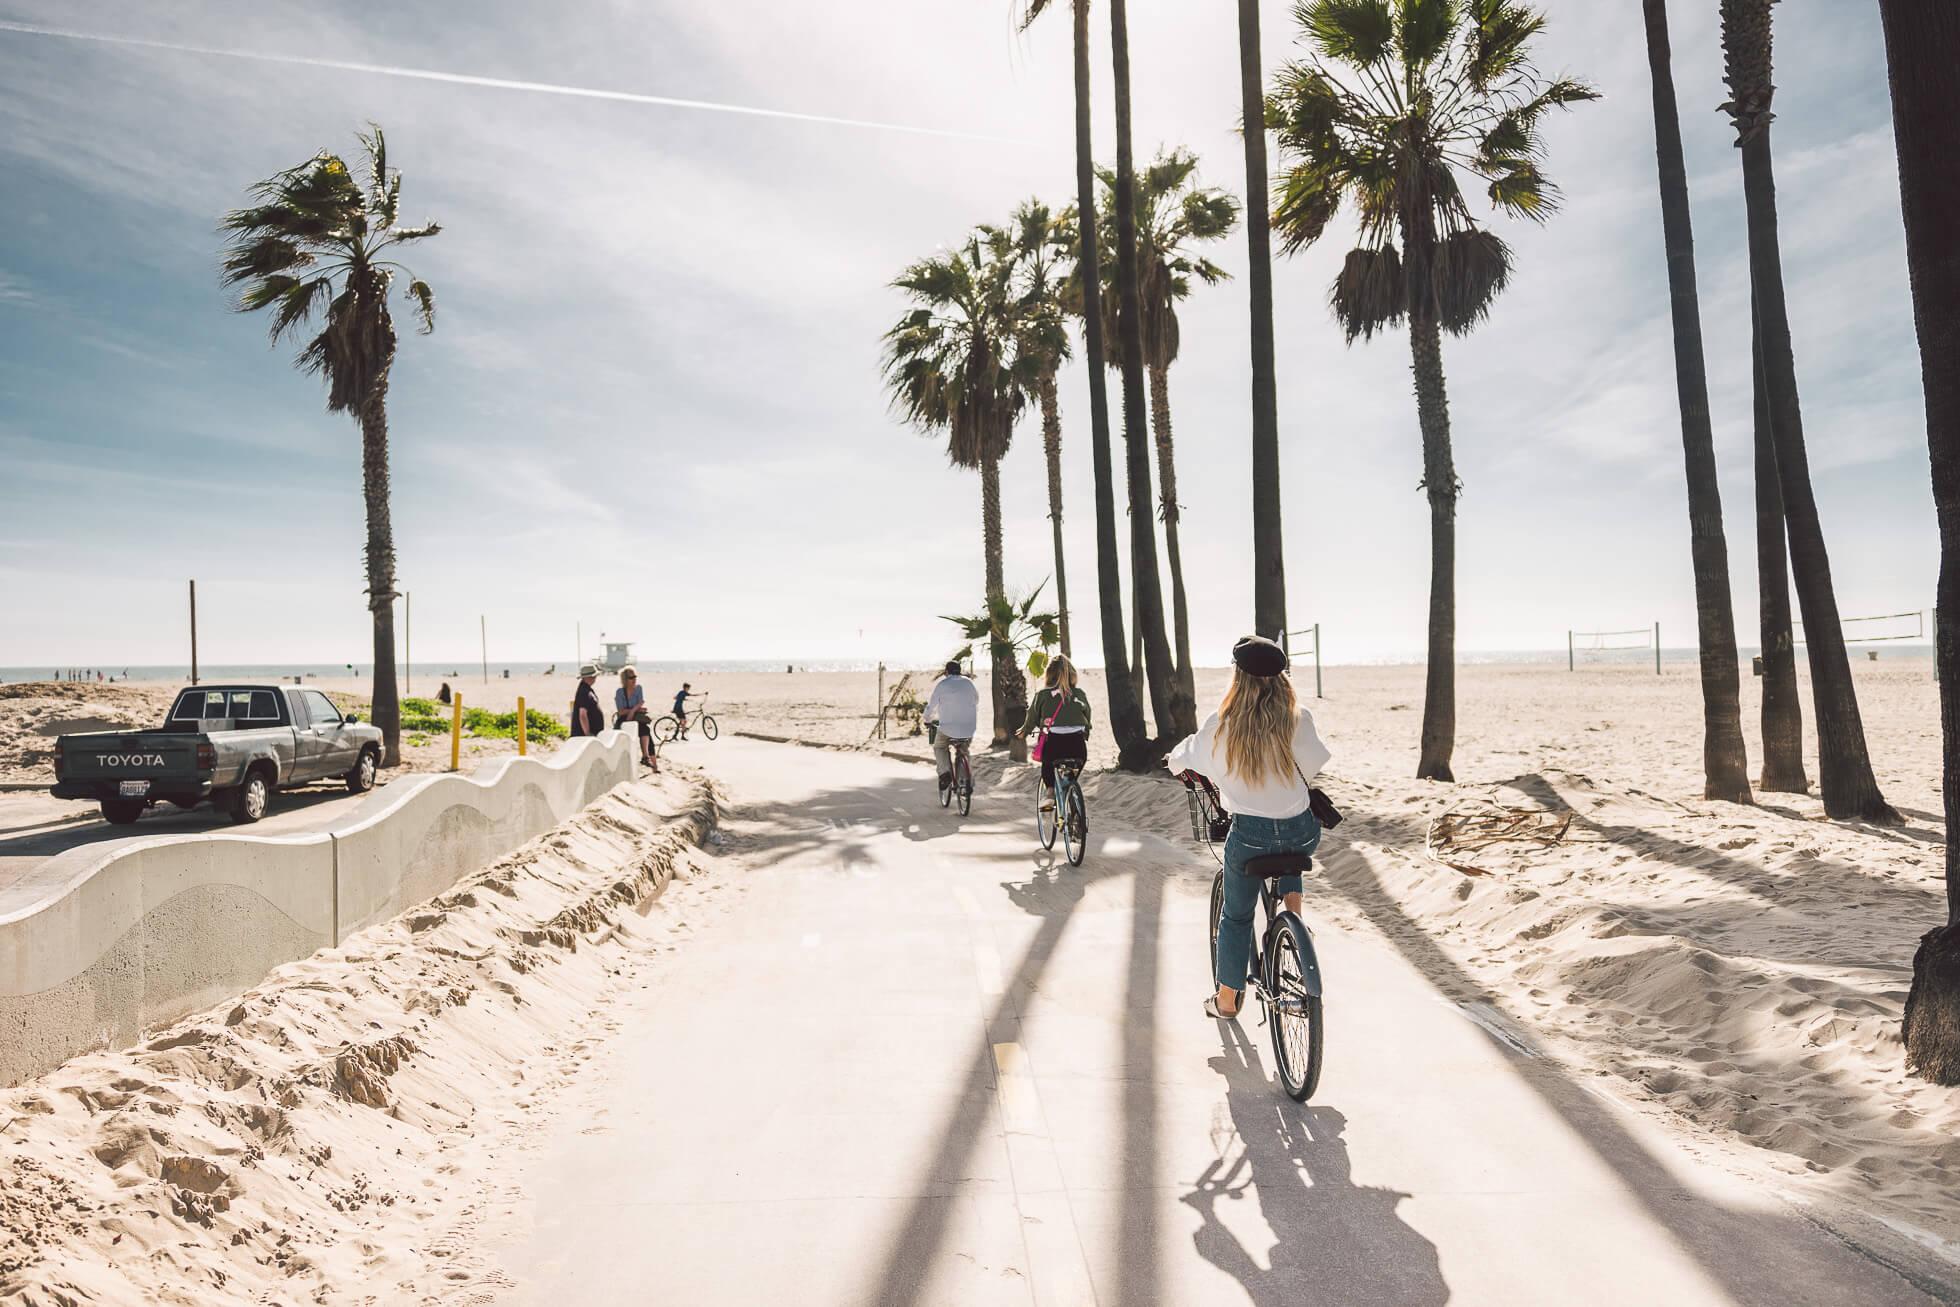 janni-deler-bike-ride-veniceL1010455